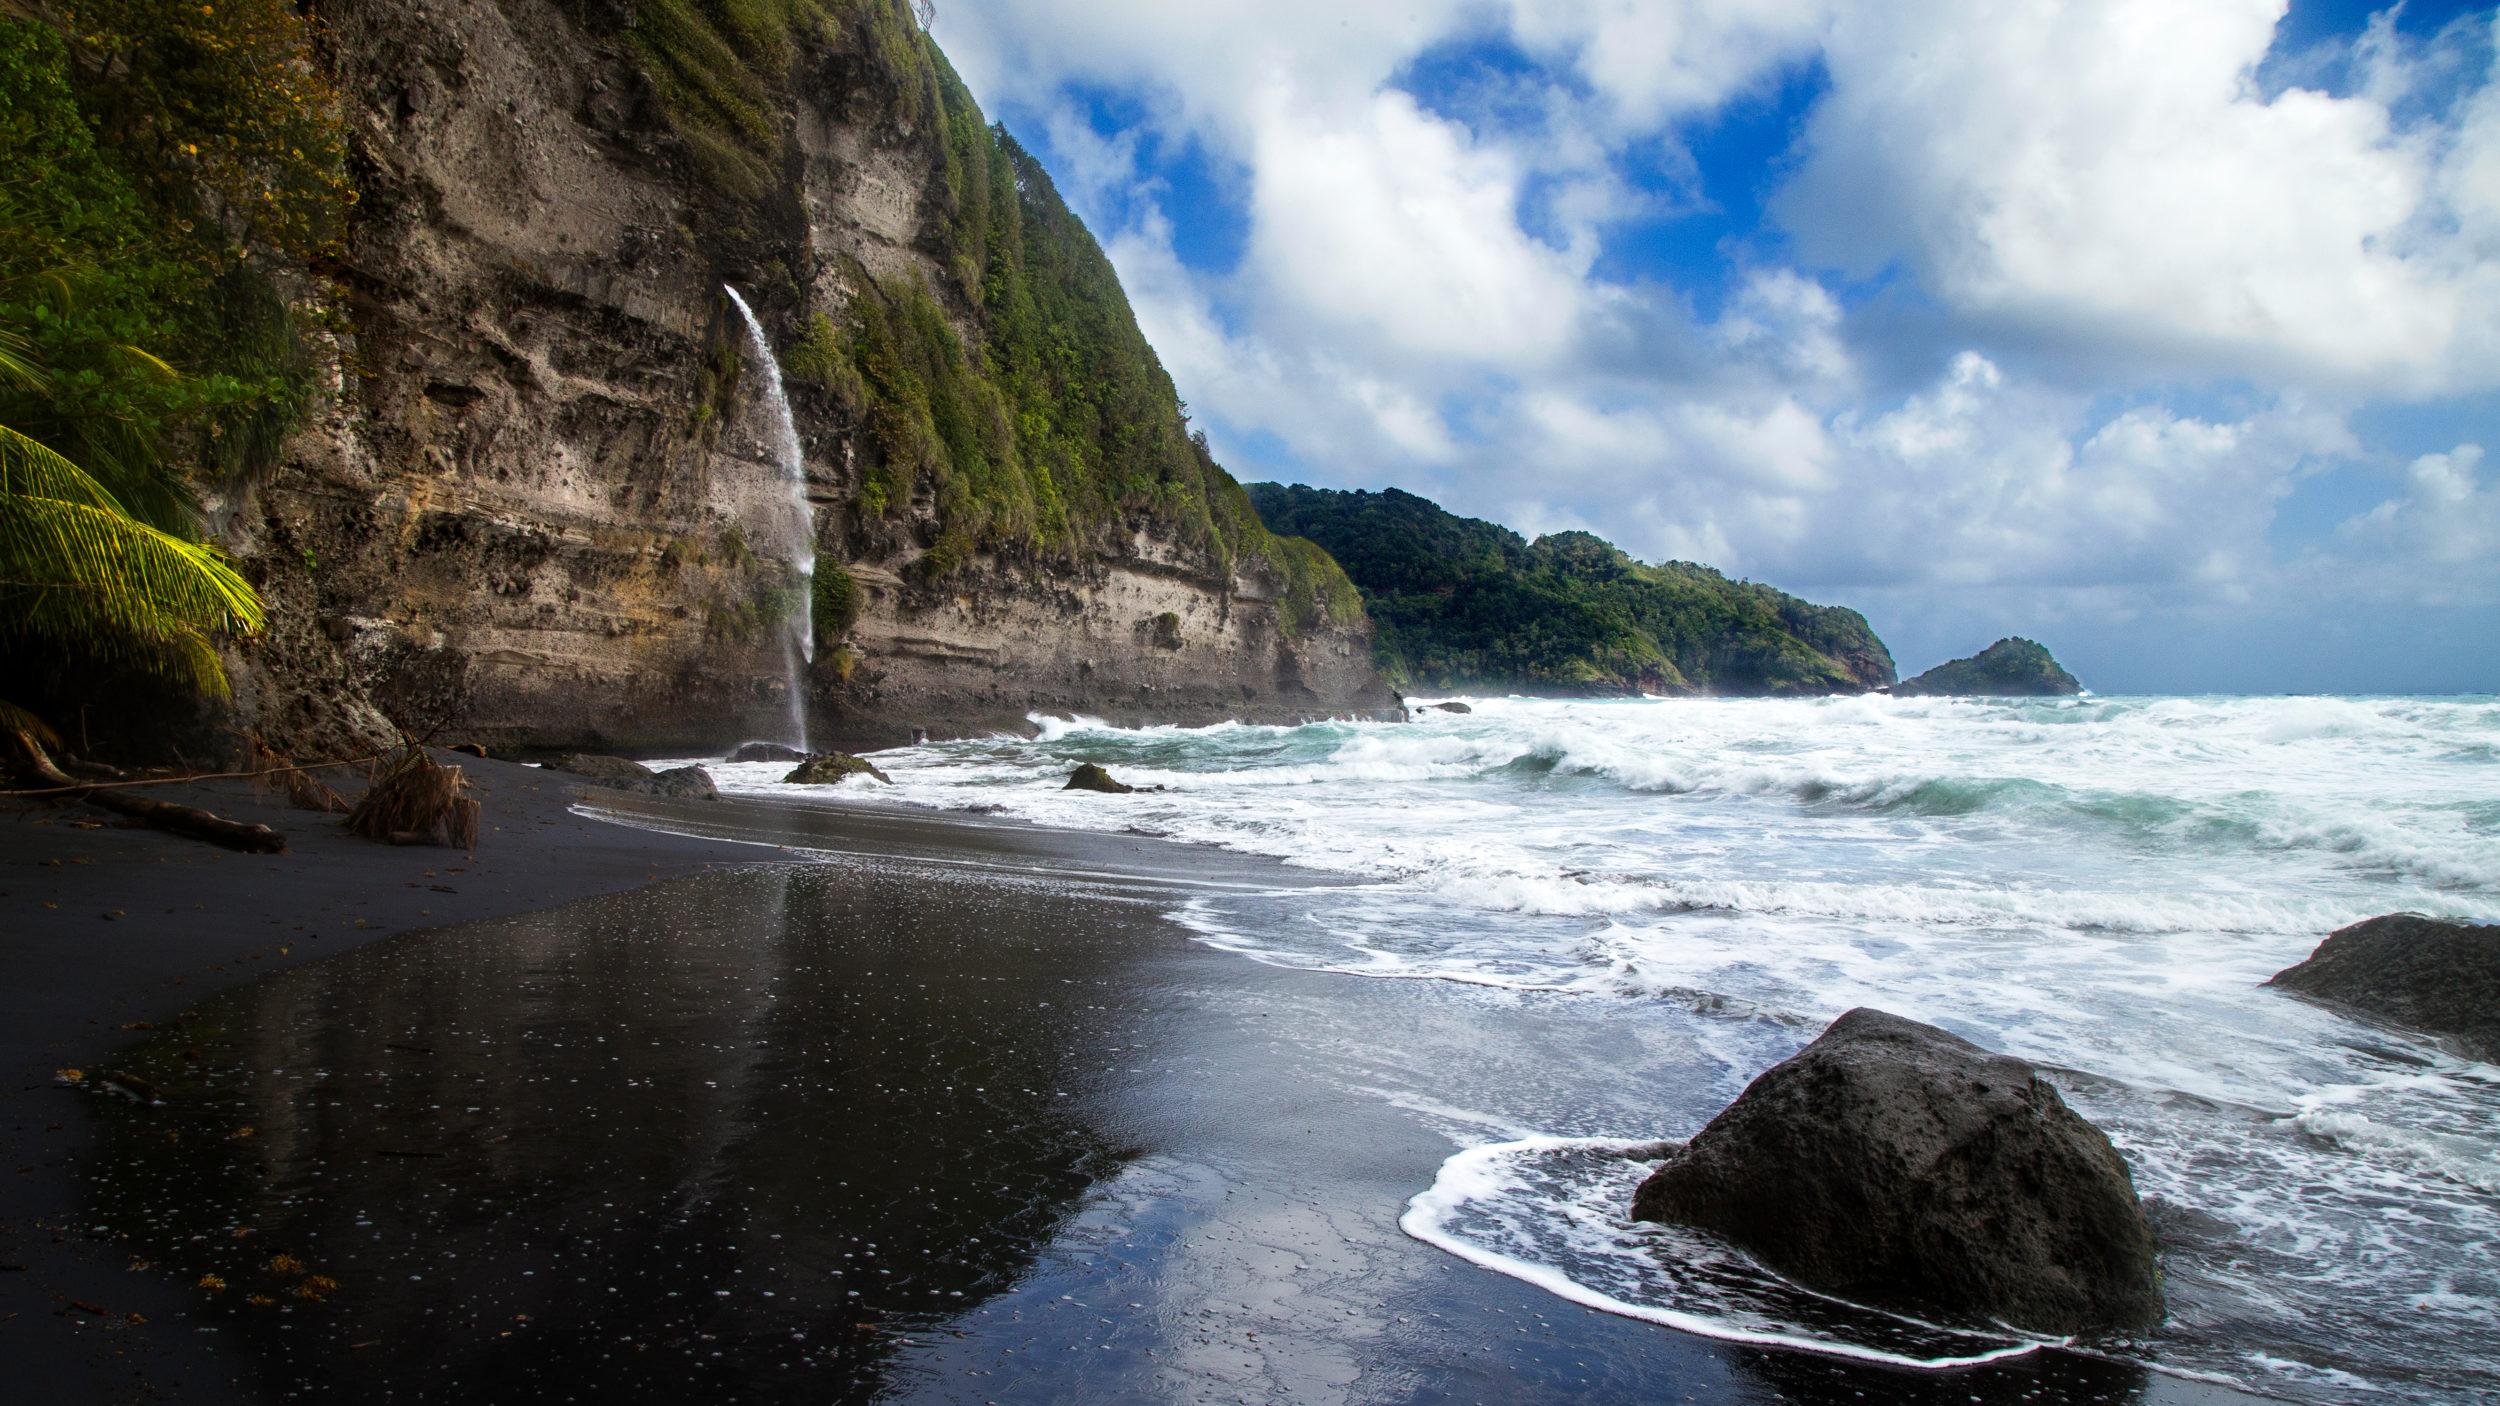 Dominica [Shutterstock]